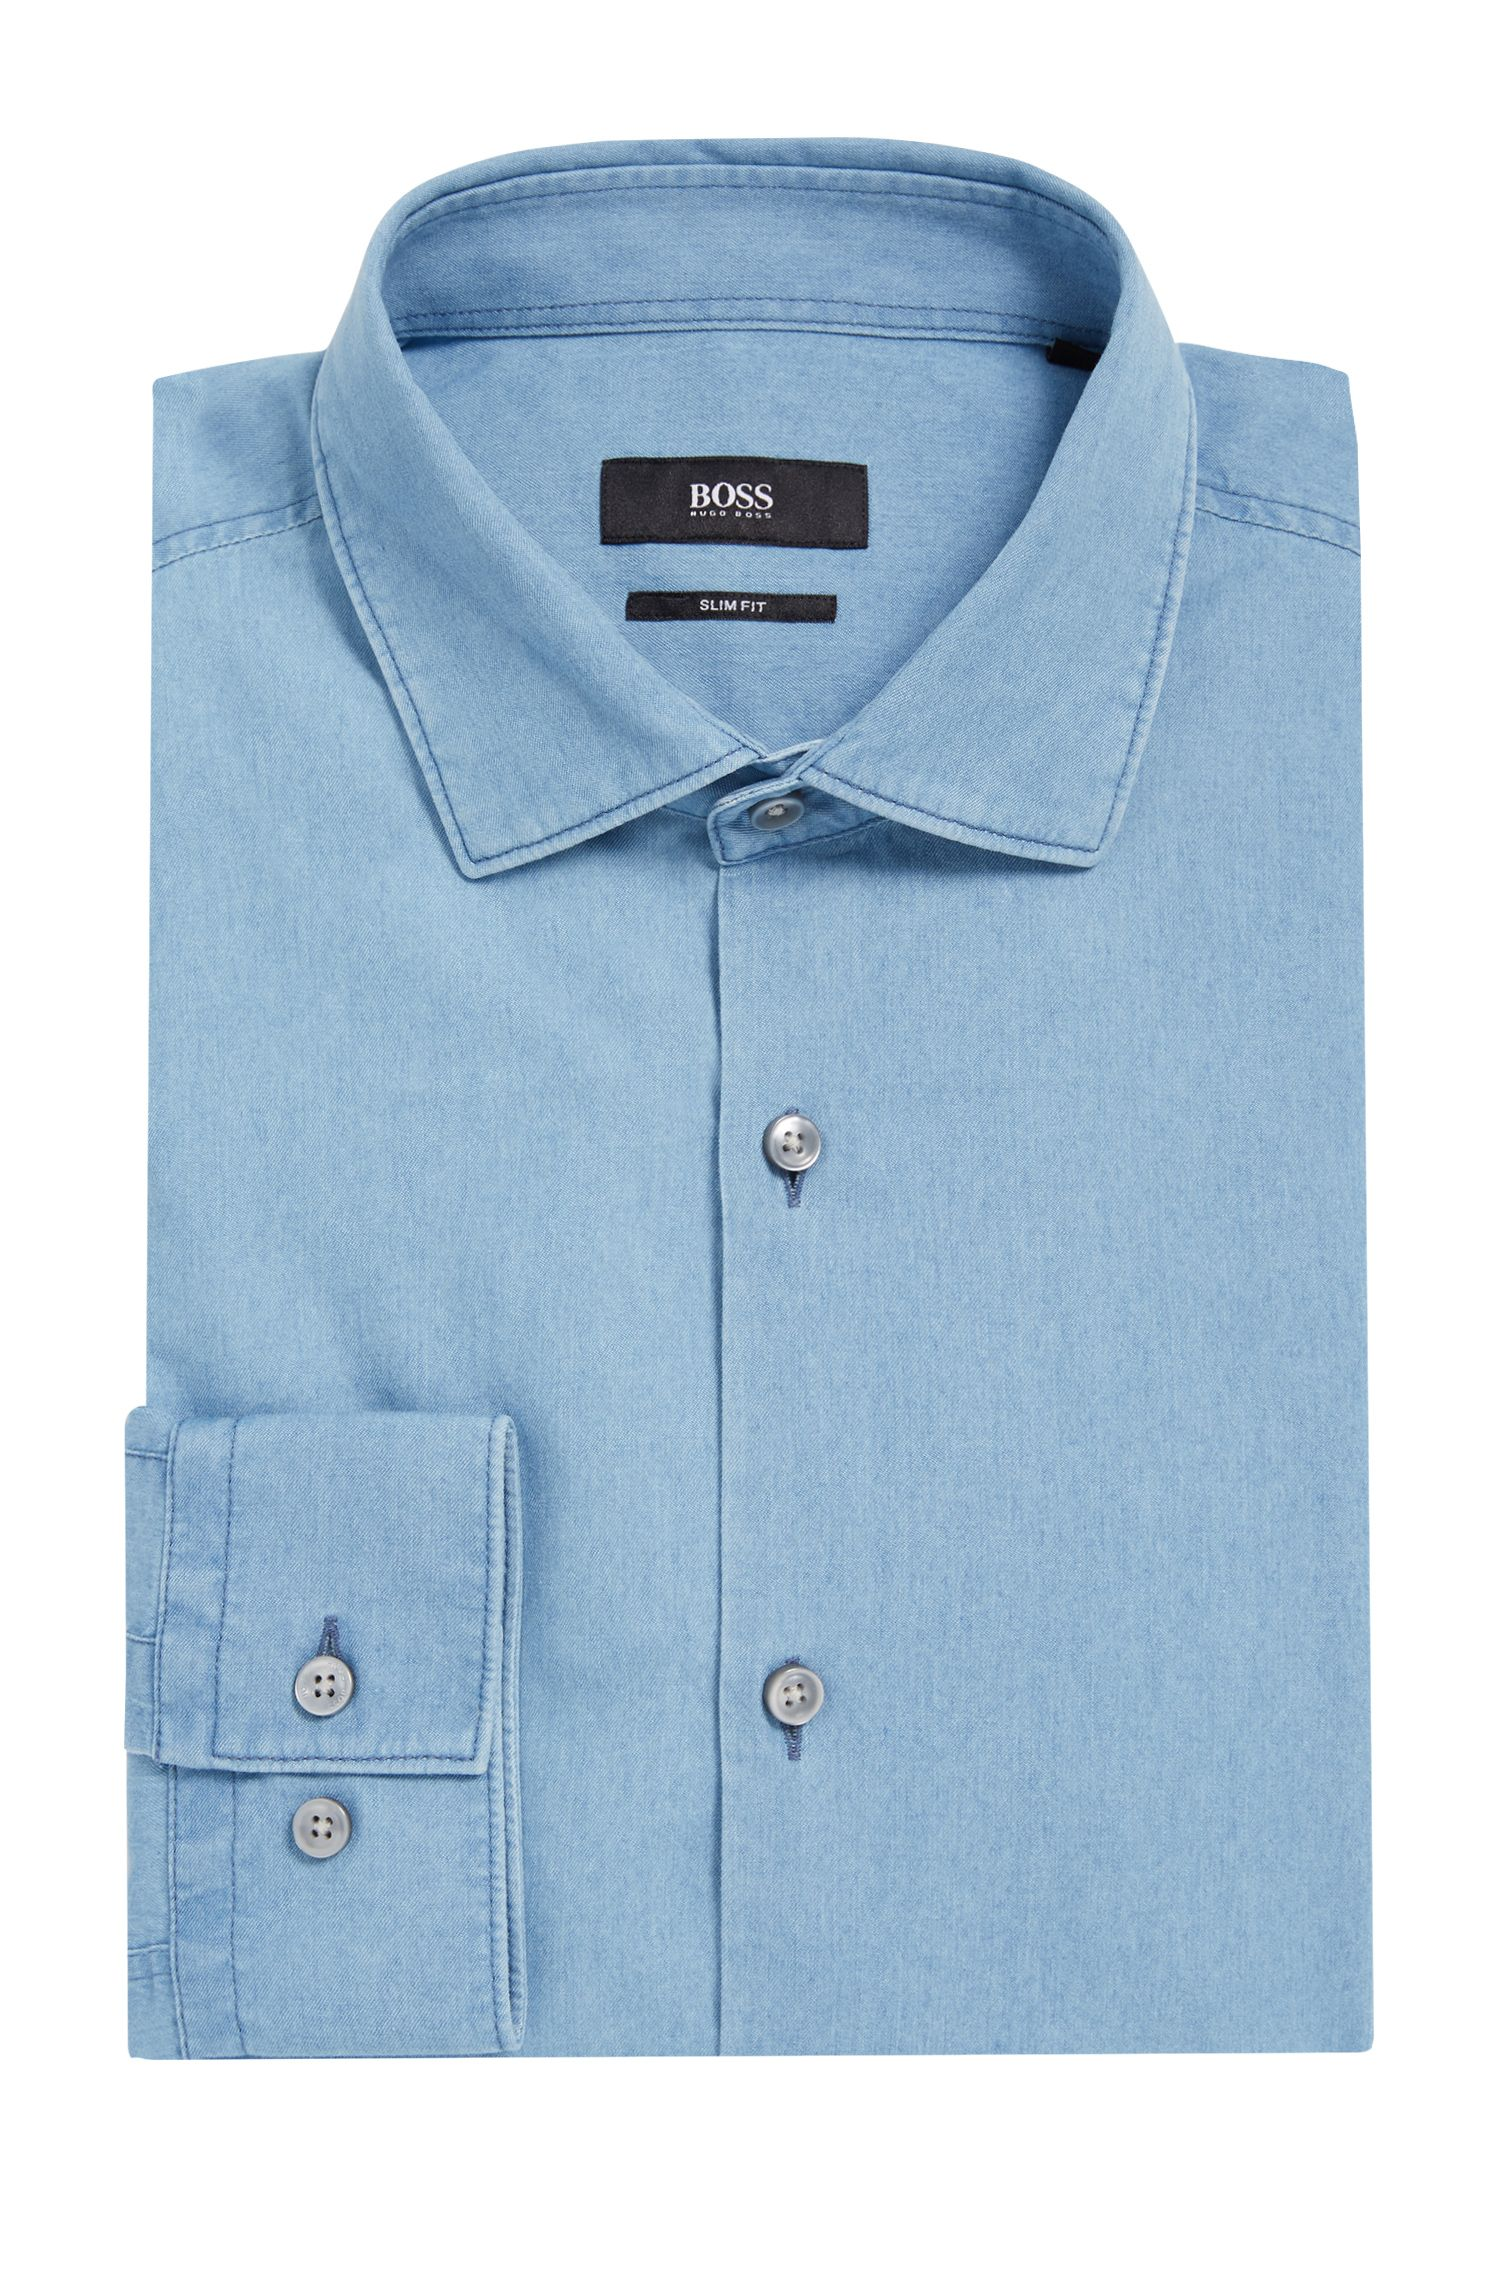 'Ismo' | Slim Fit, Cotton Dress Shirt